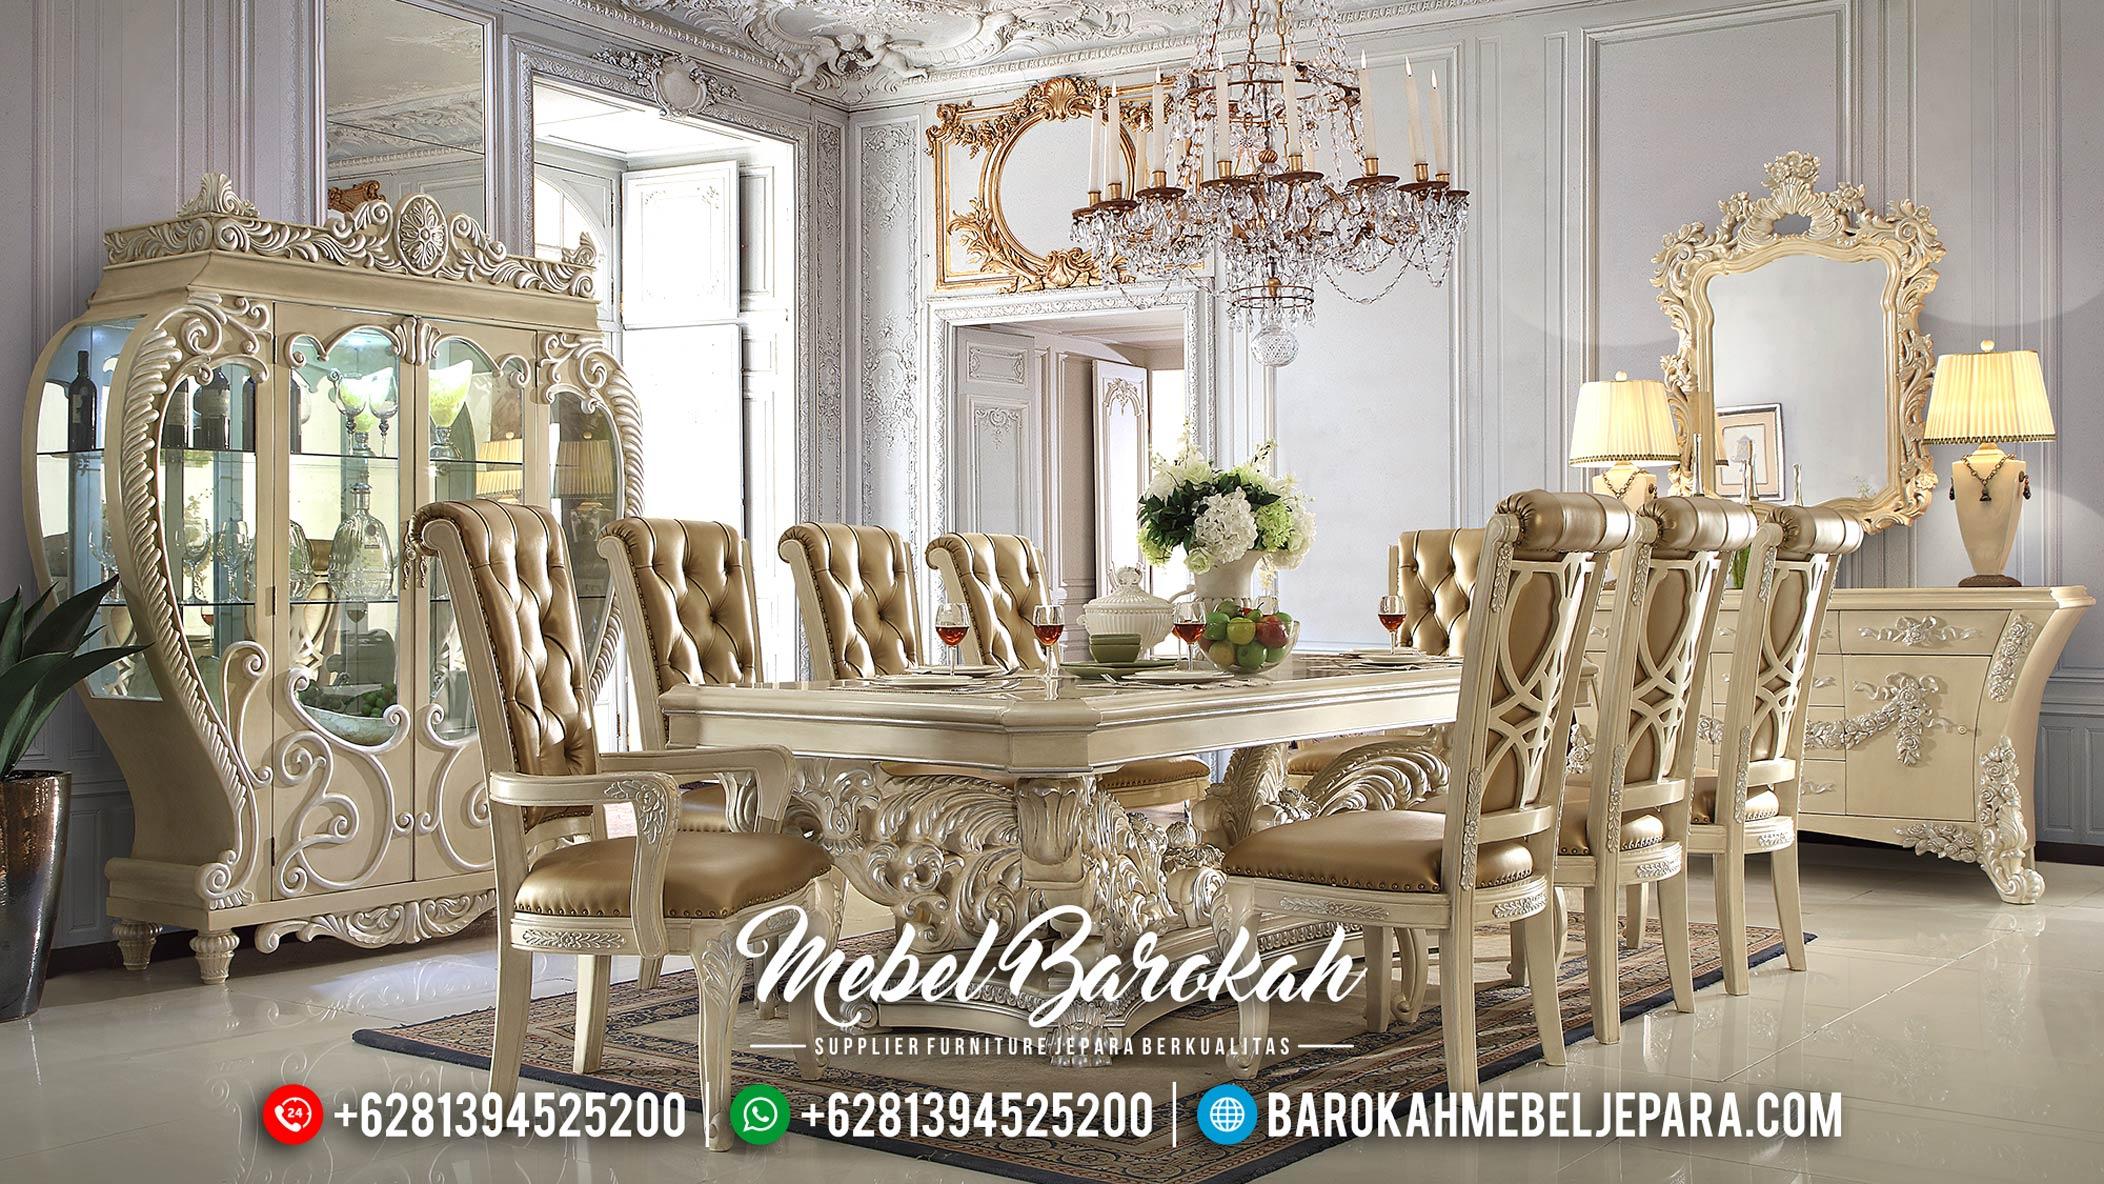 Jual Meja Makan Ukiran Mewah Glamorous Luxury White Ivory Classic MB-0535